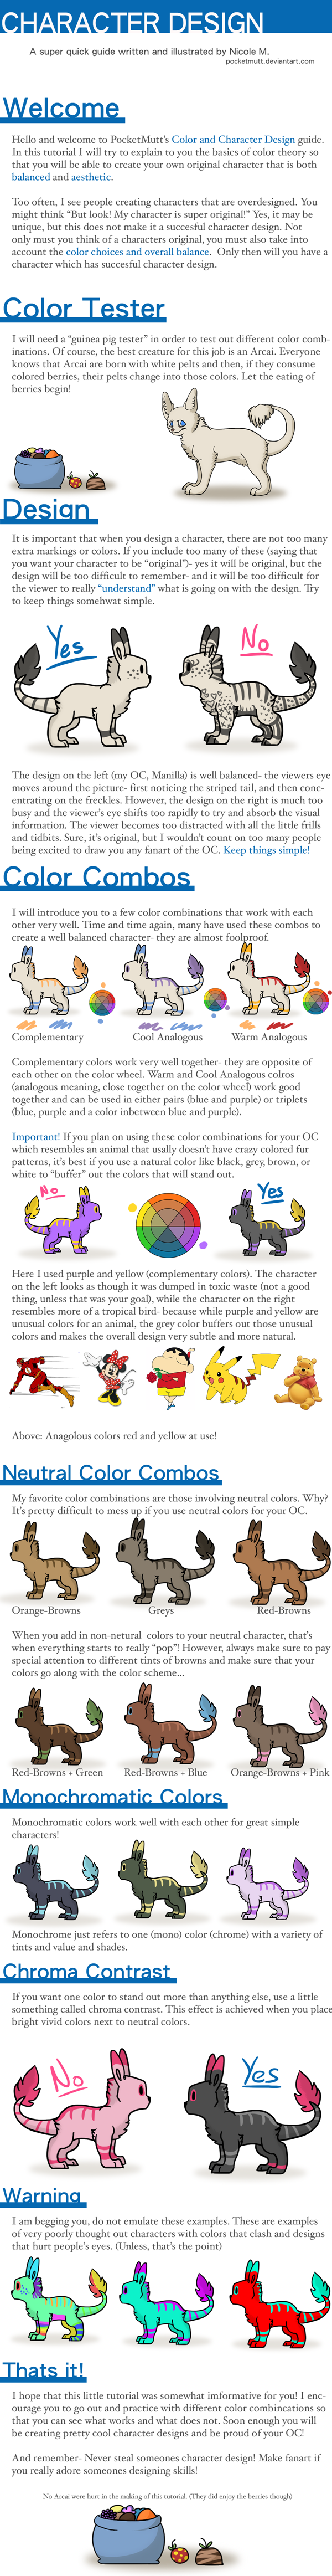 Character Design Tutorial Tumblr : Character design tutorial by i moosker on deviantart